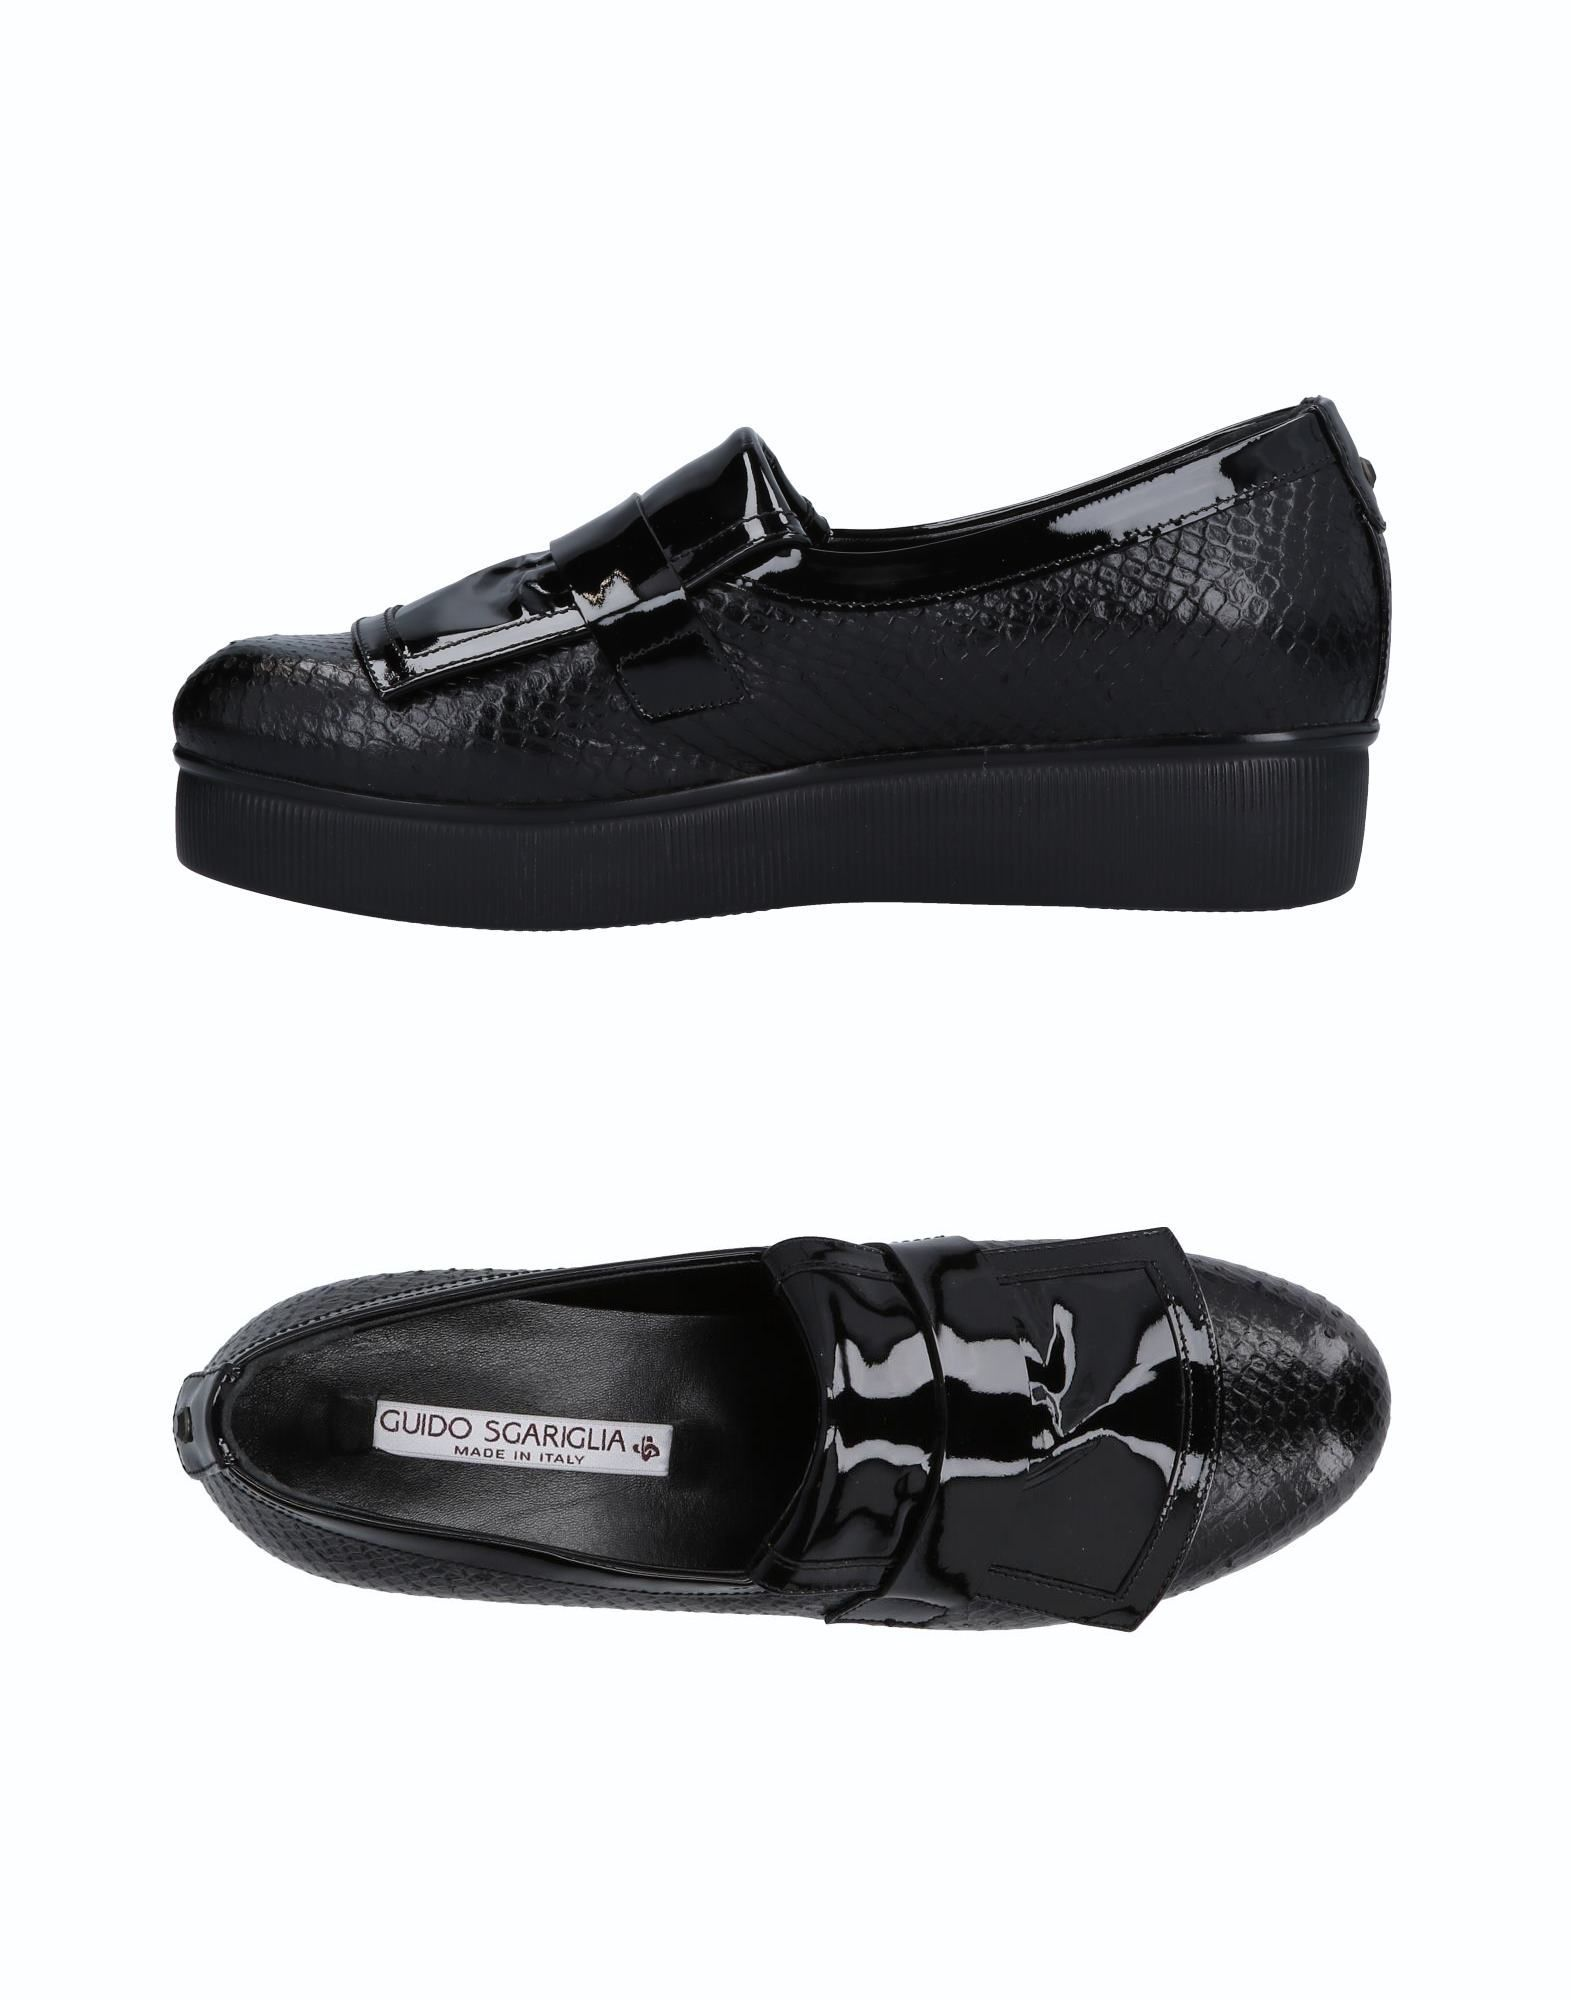 Stilvolle Mokassins billige Schuhe Guido Sgariglia Mokassins Stilvolle Damen  11501484DU 4f4d2e